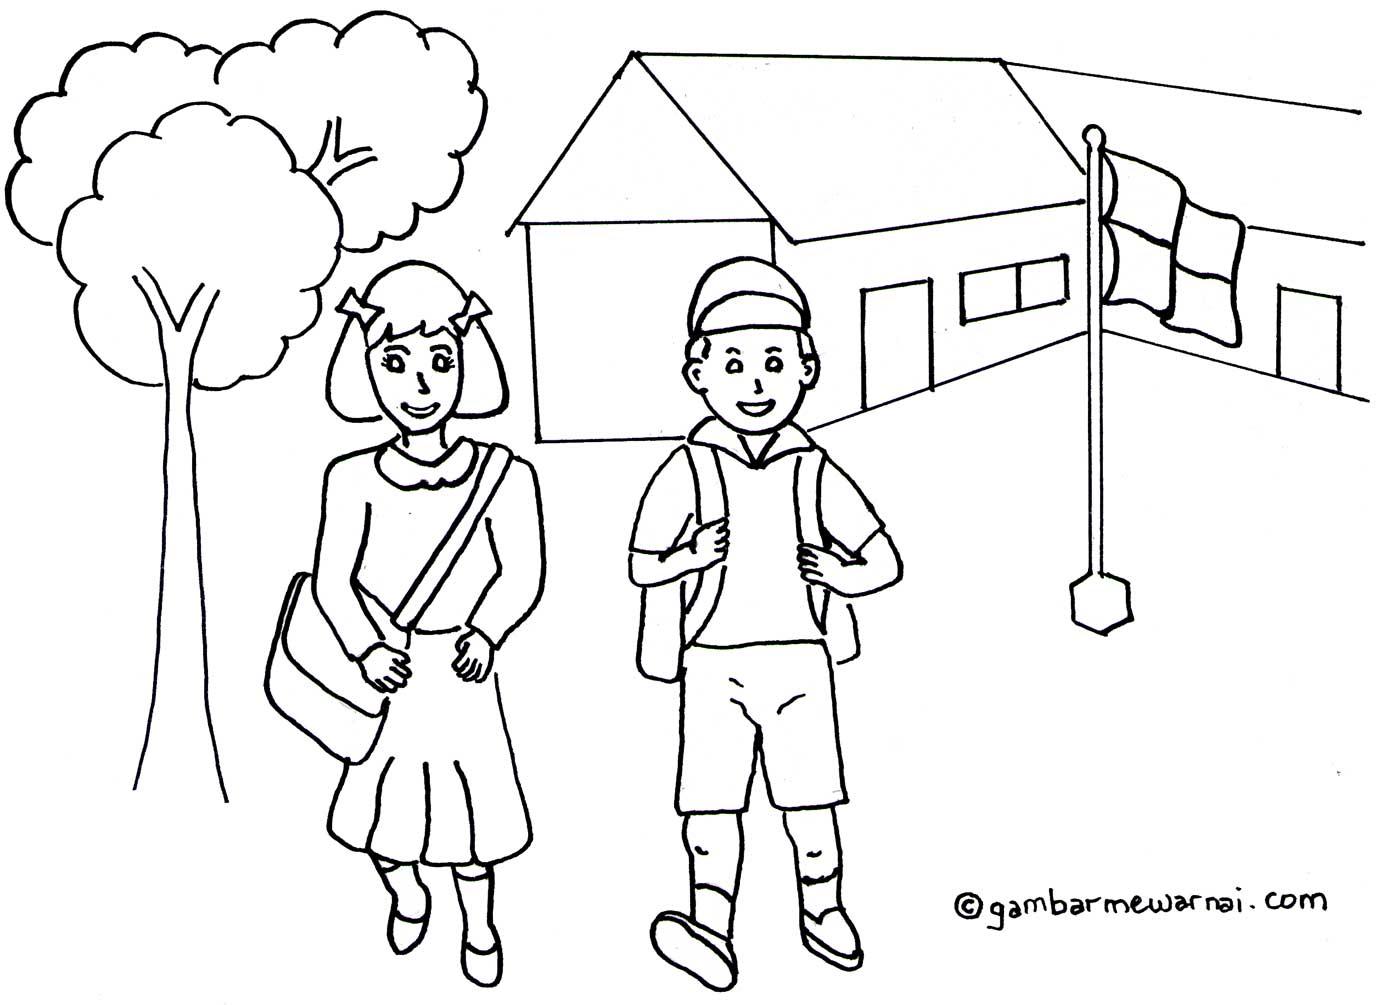 Gambar Pemandangan Untuk Anak Paud Toko Fd Flashdisk Flashdrive